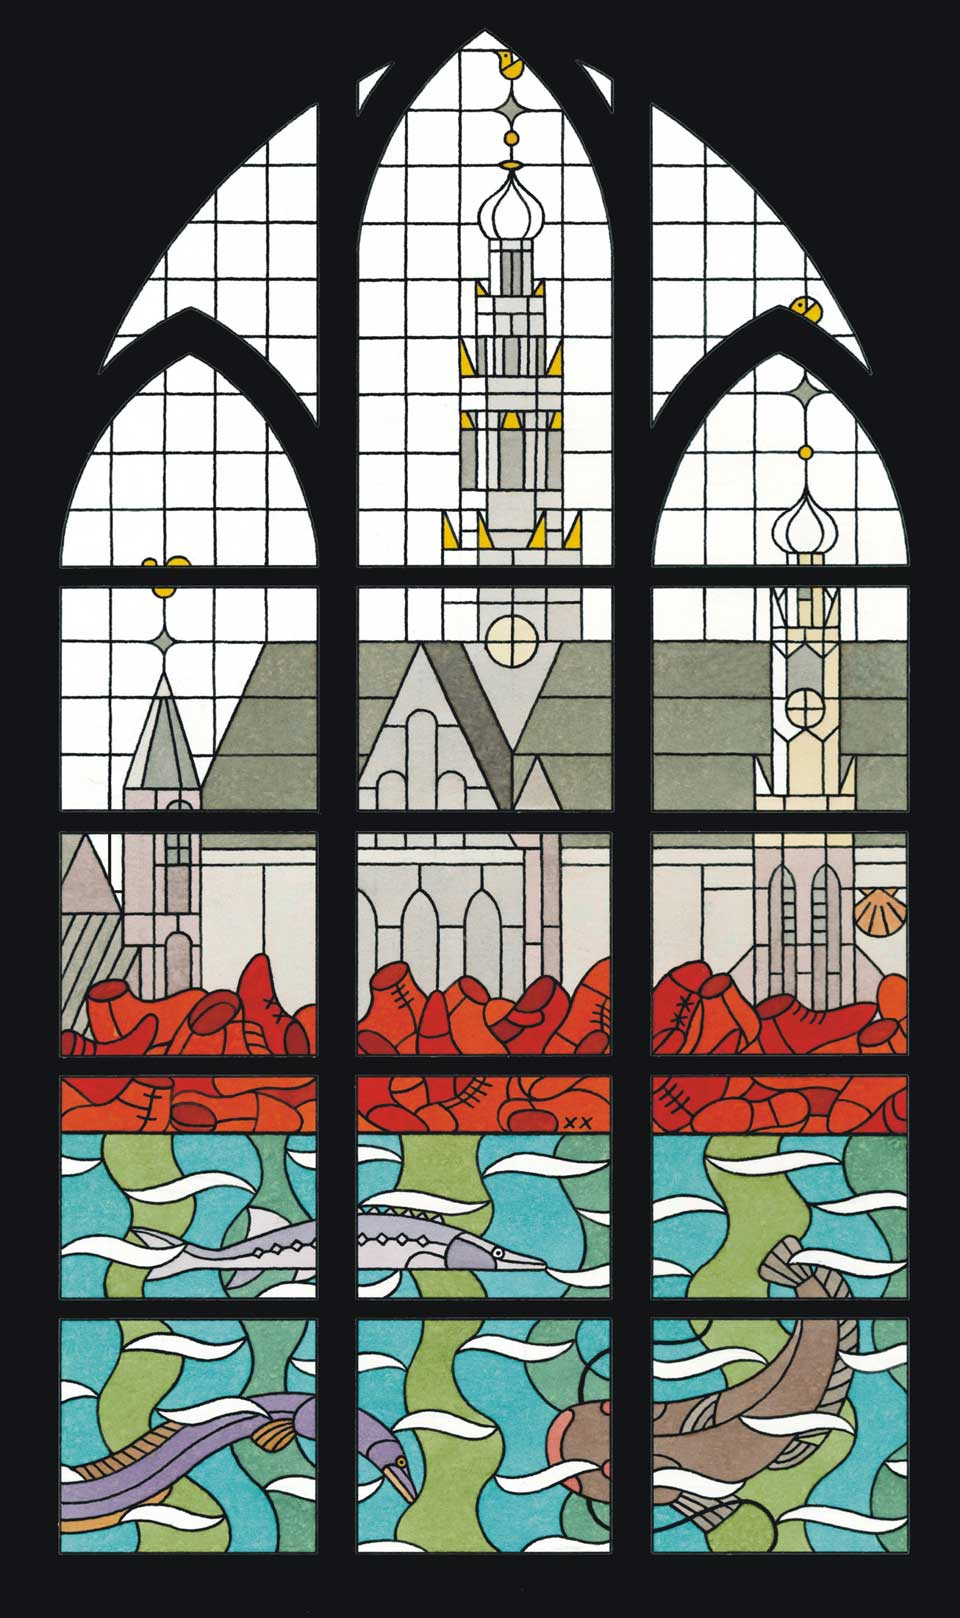 Glas-in-lood ontwerp van Joost Swarte voor de Bakenesserkerk in Haarlem.